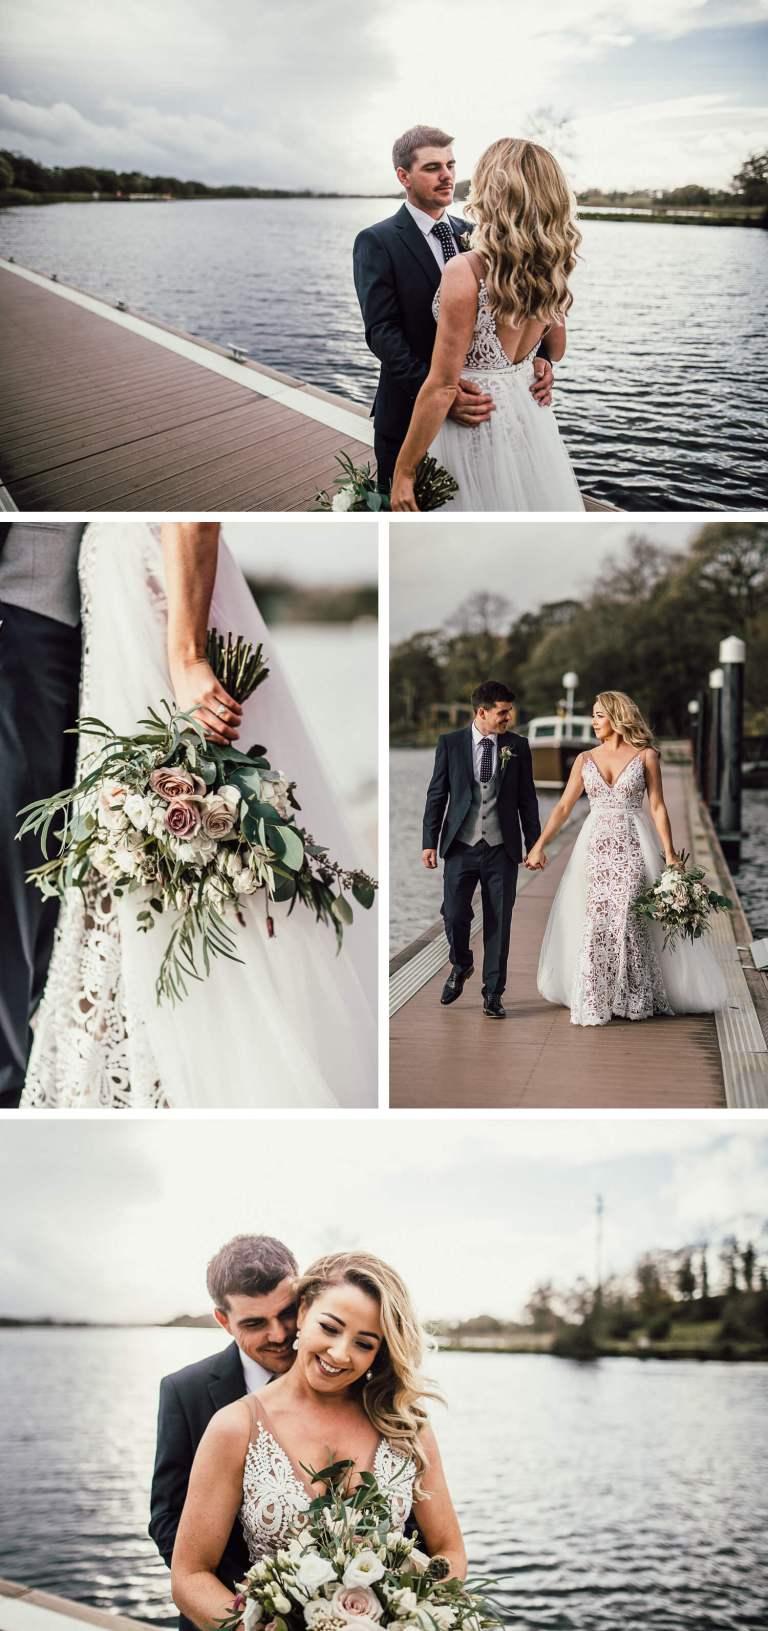 darren-fitzpatrick-photography- killyhevlin-wedding 23